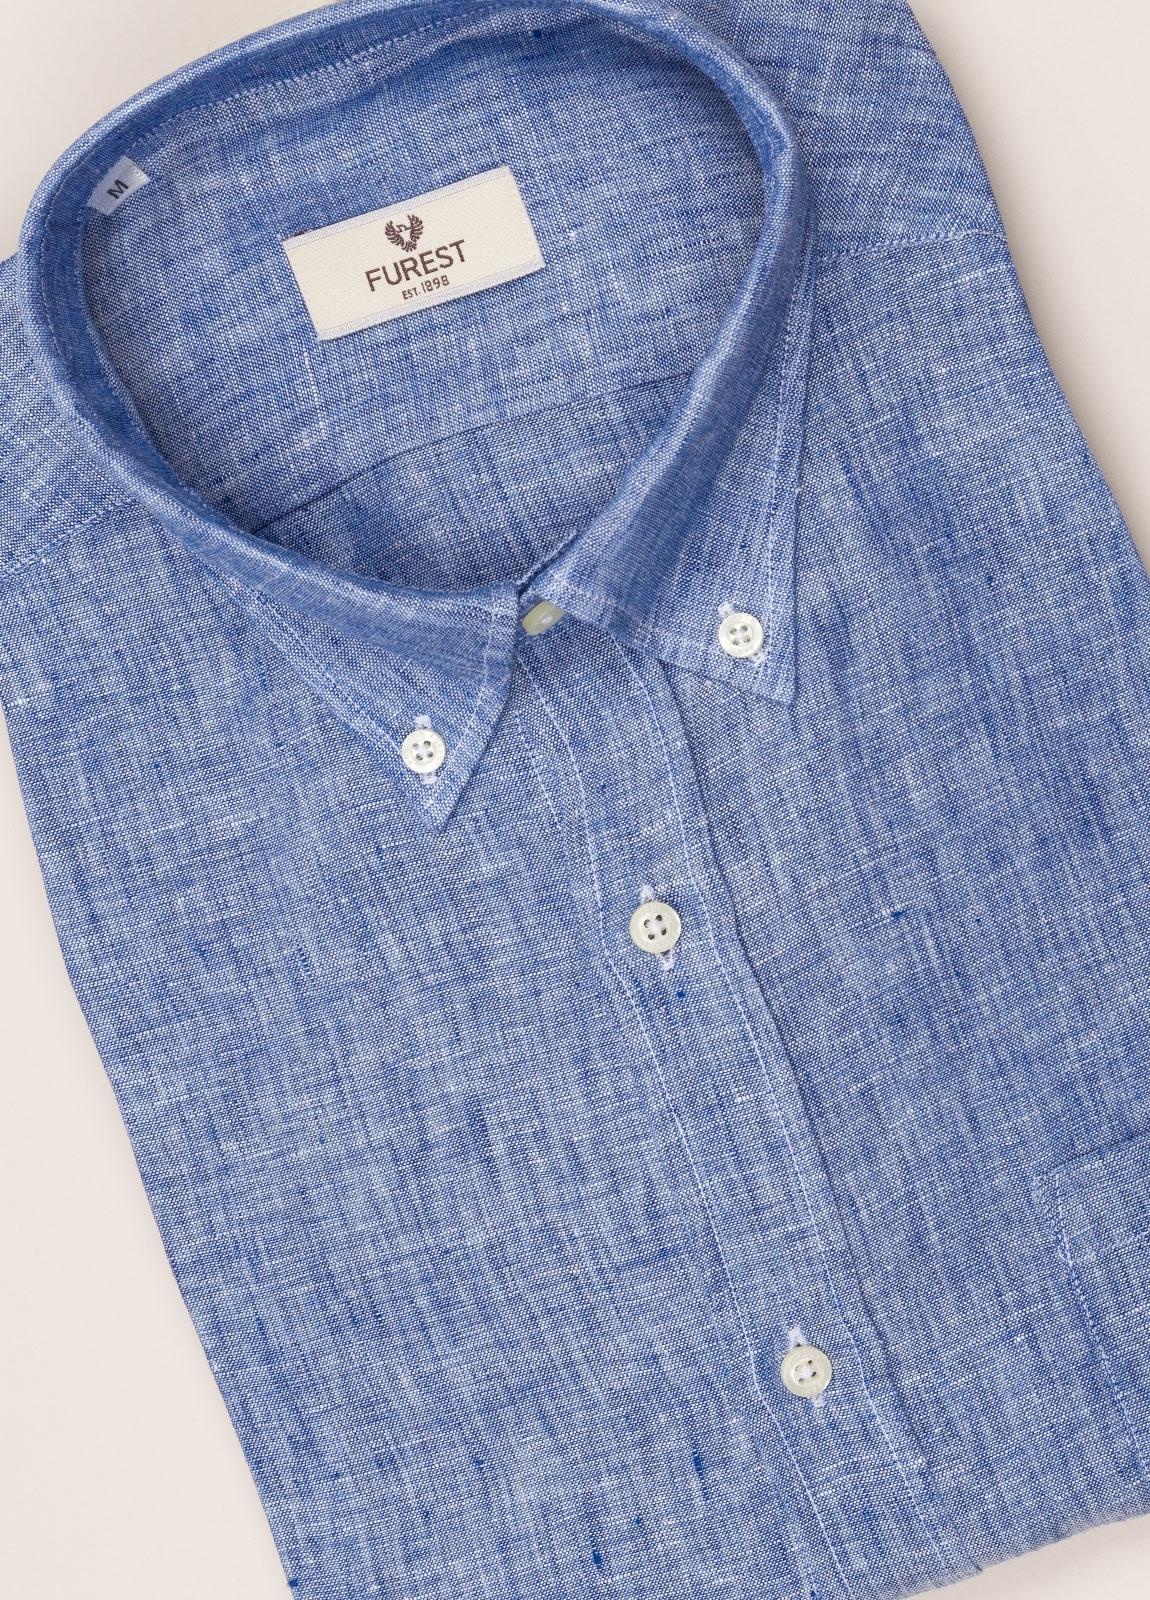 Camisa sport FUREST COLECCIÓN REGULAR FIT Lino azul - Ítem2